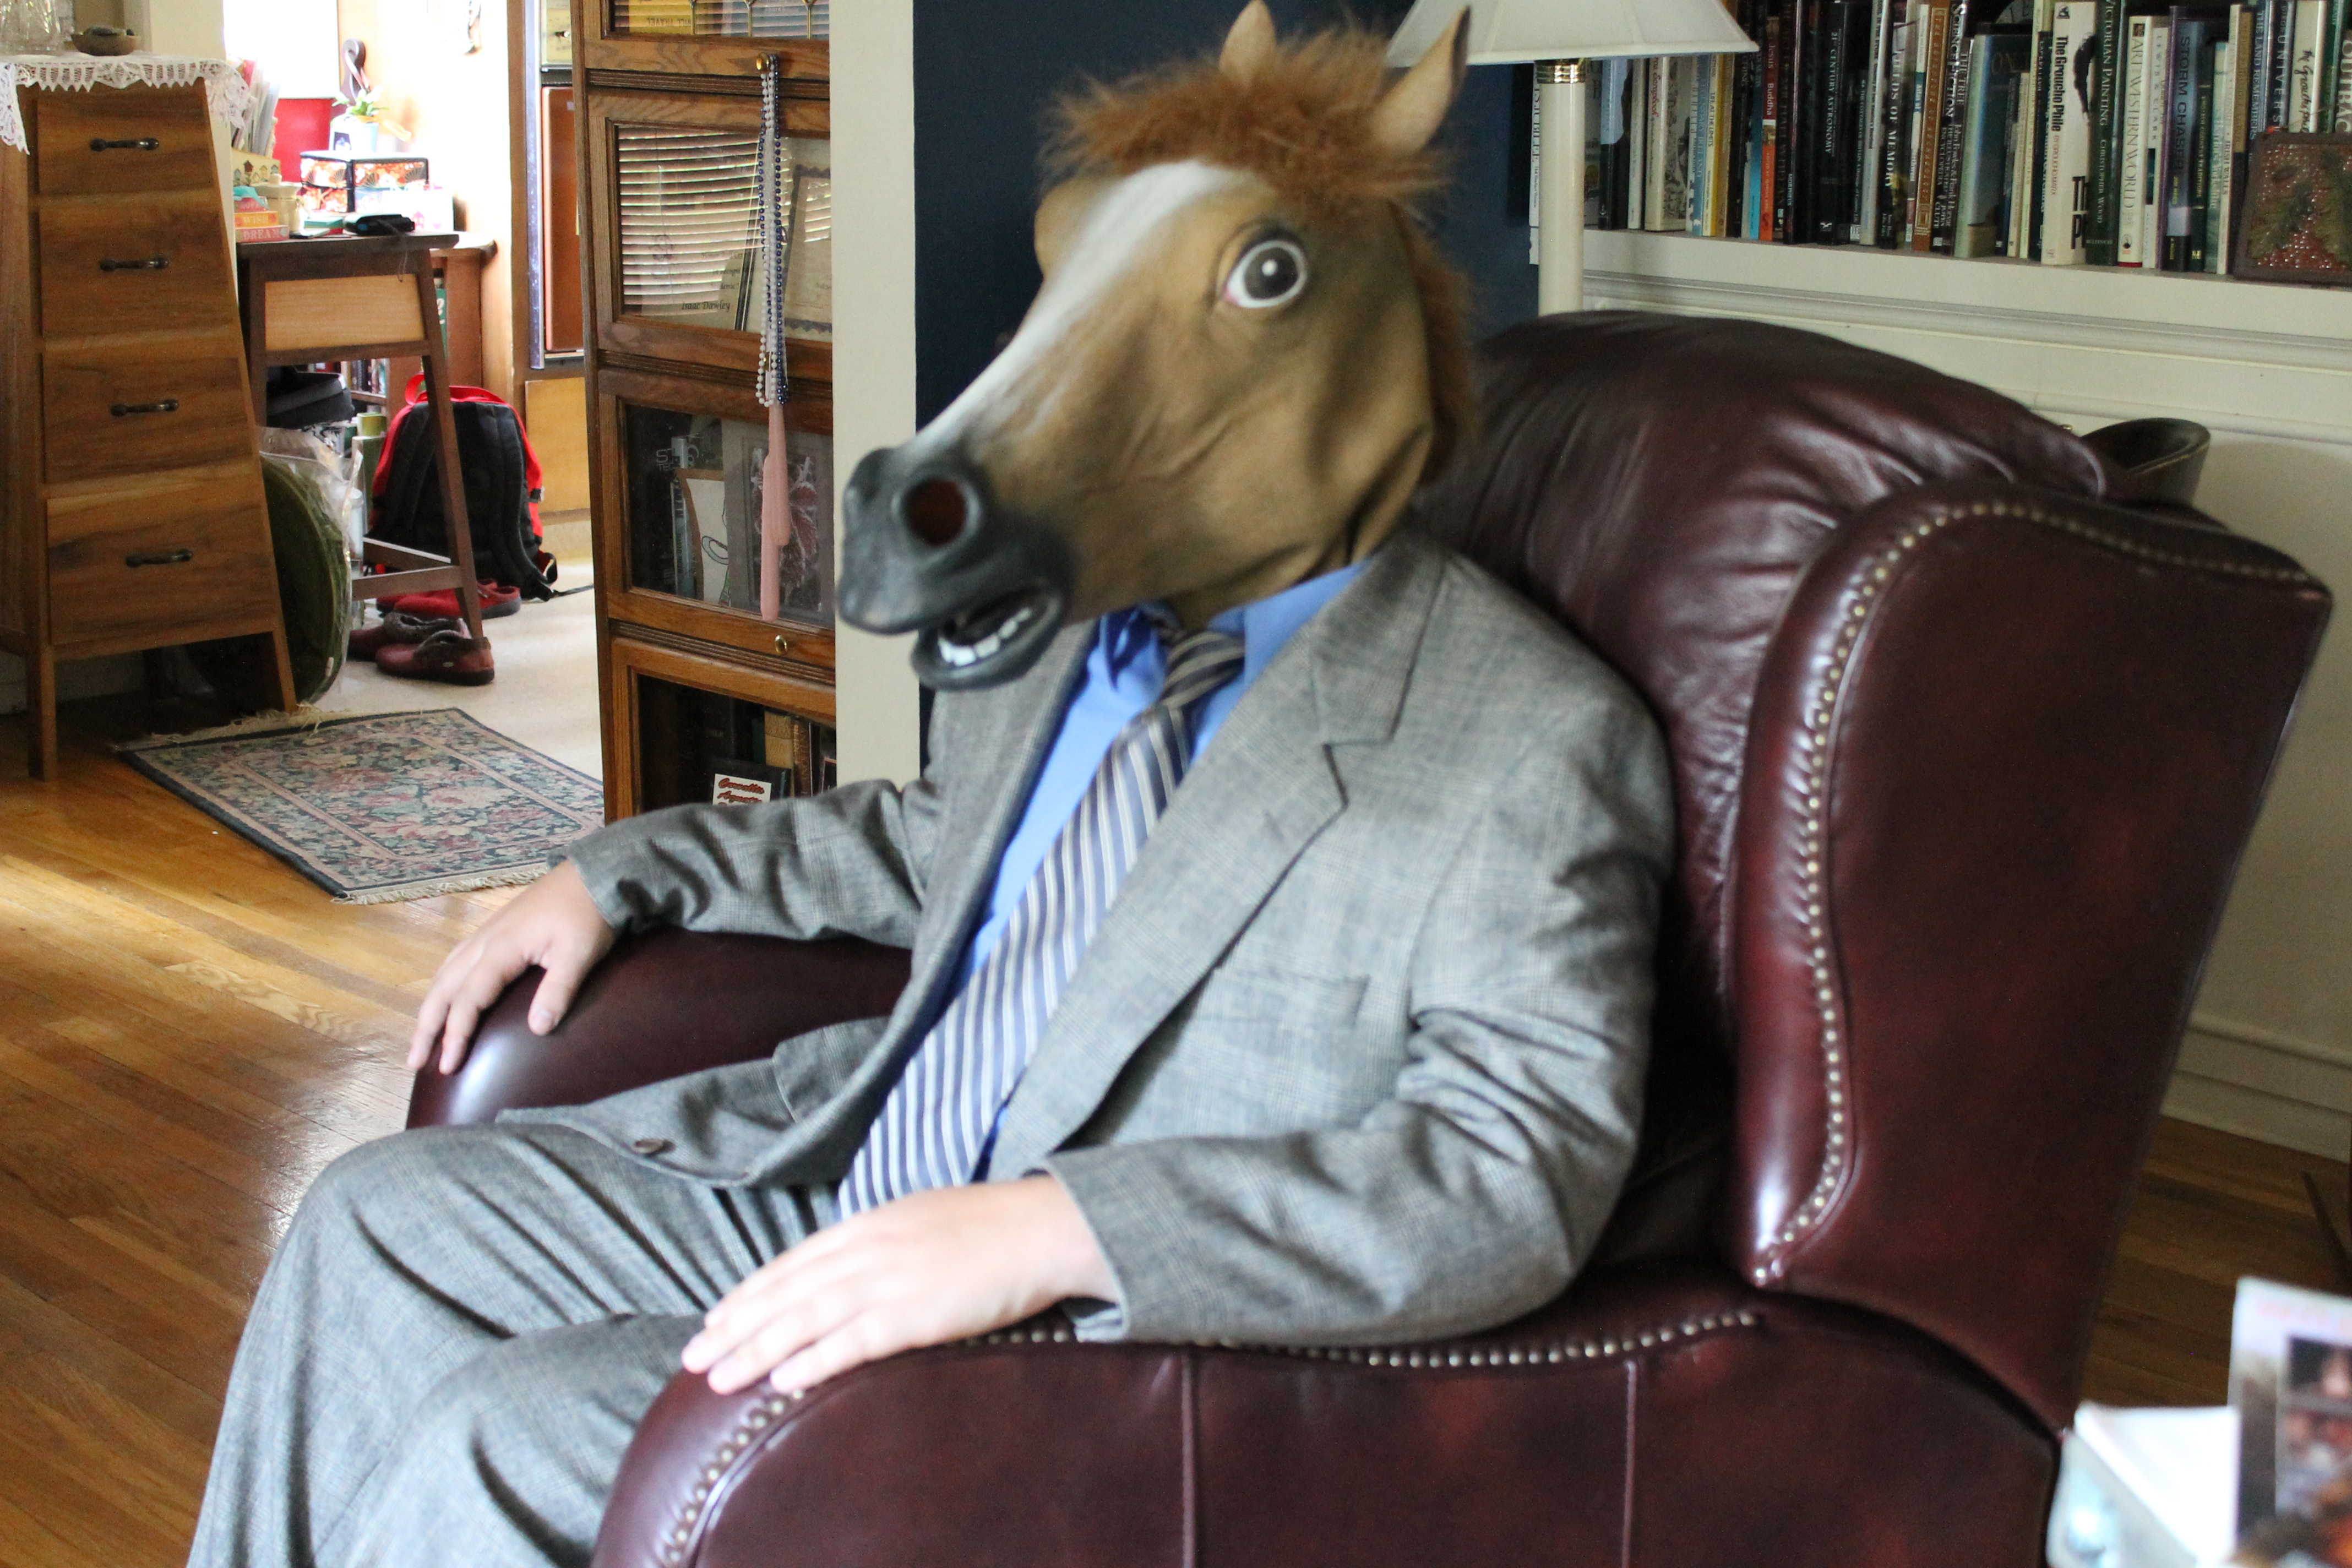 classy_horse_by_team_horse-d5hxoh4.jpg